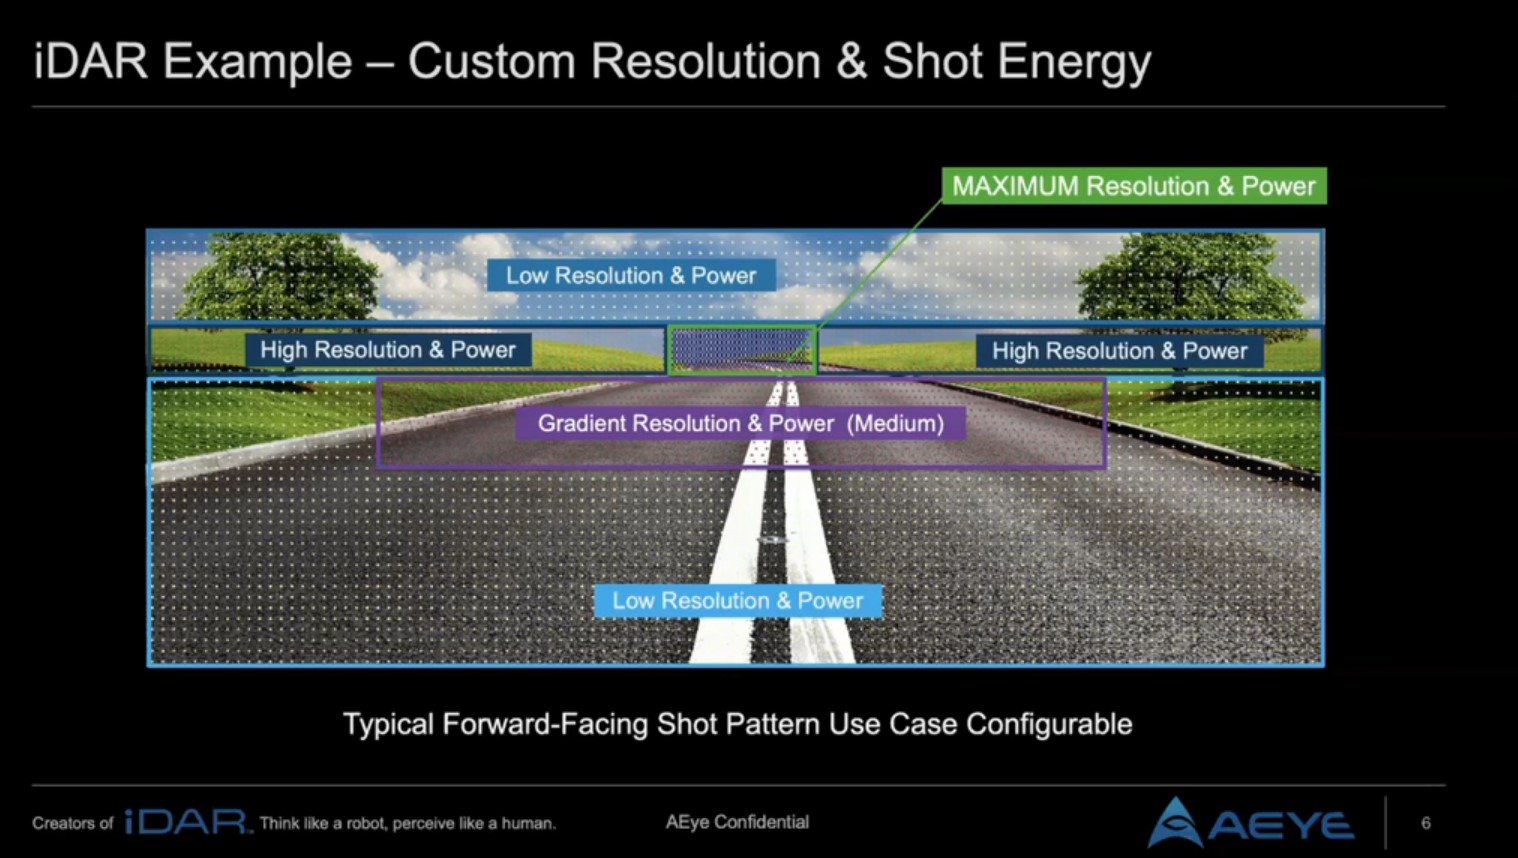 Accelerating ADAS through High Performance, Long Range Configurable LiDAR